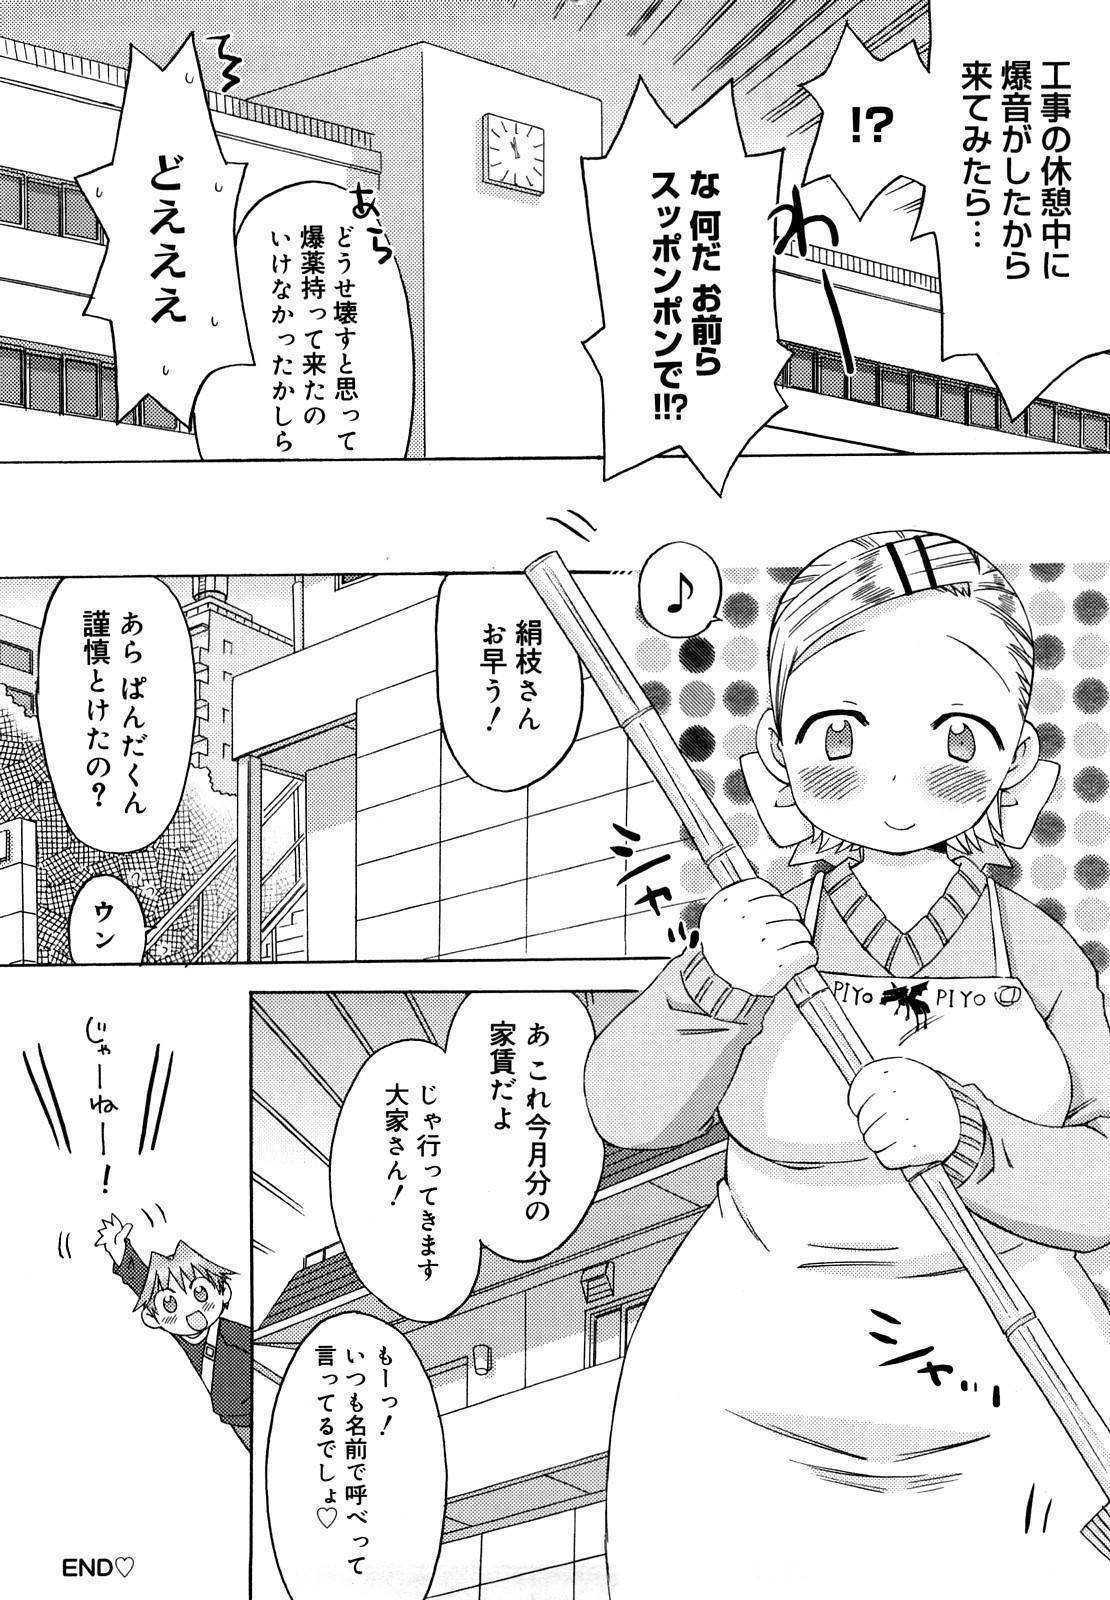 Hatsuden Pandakun! Shinsouban 192